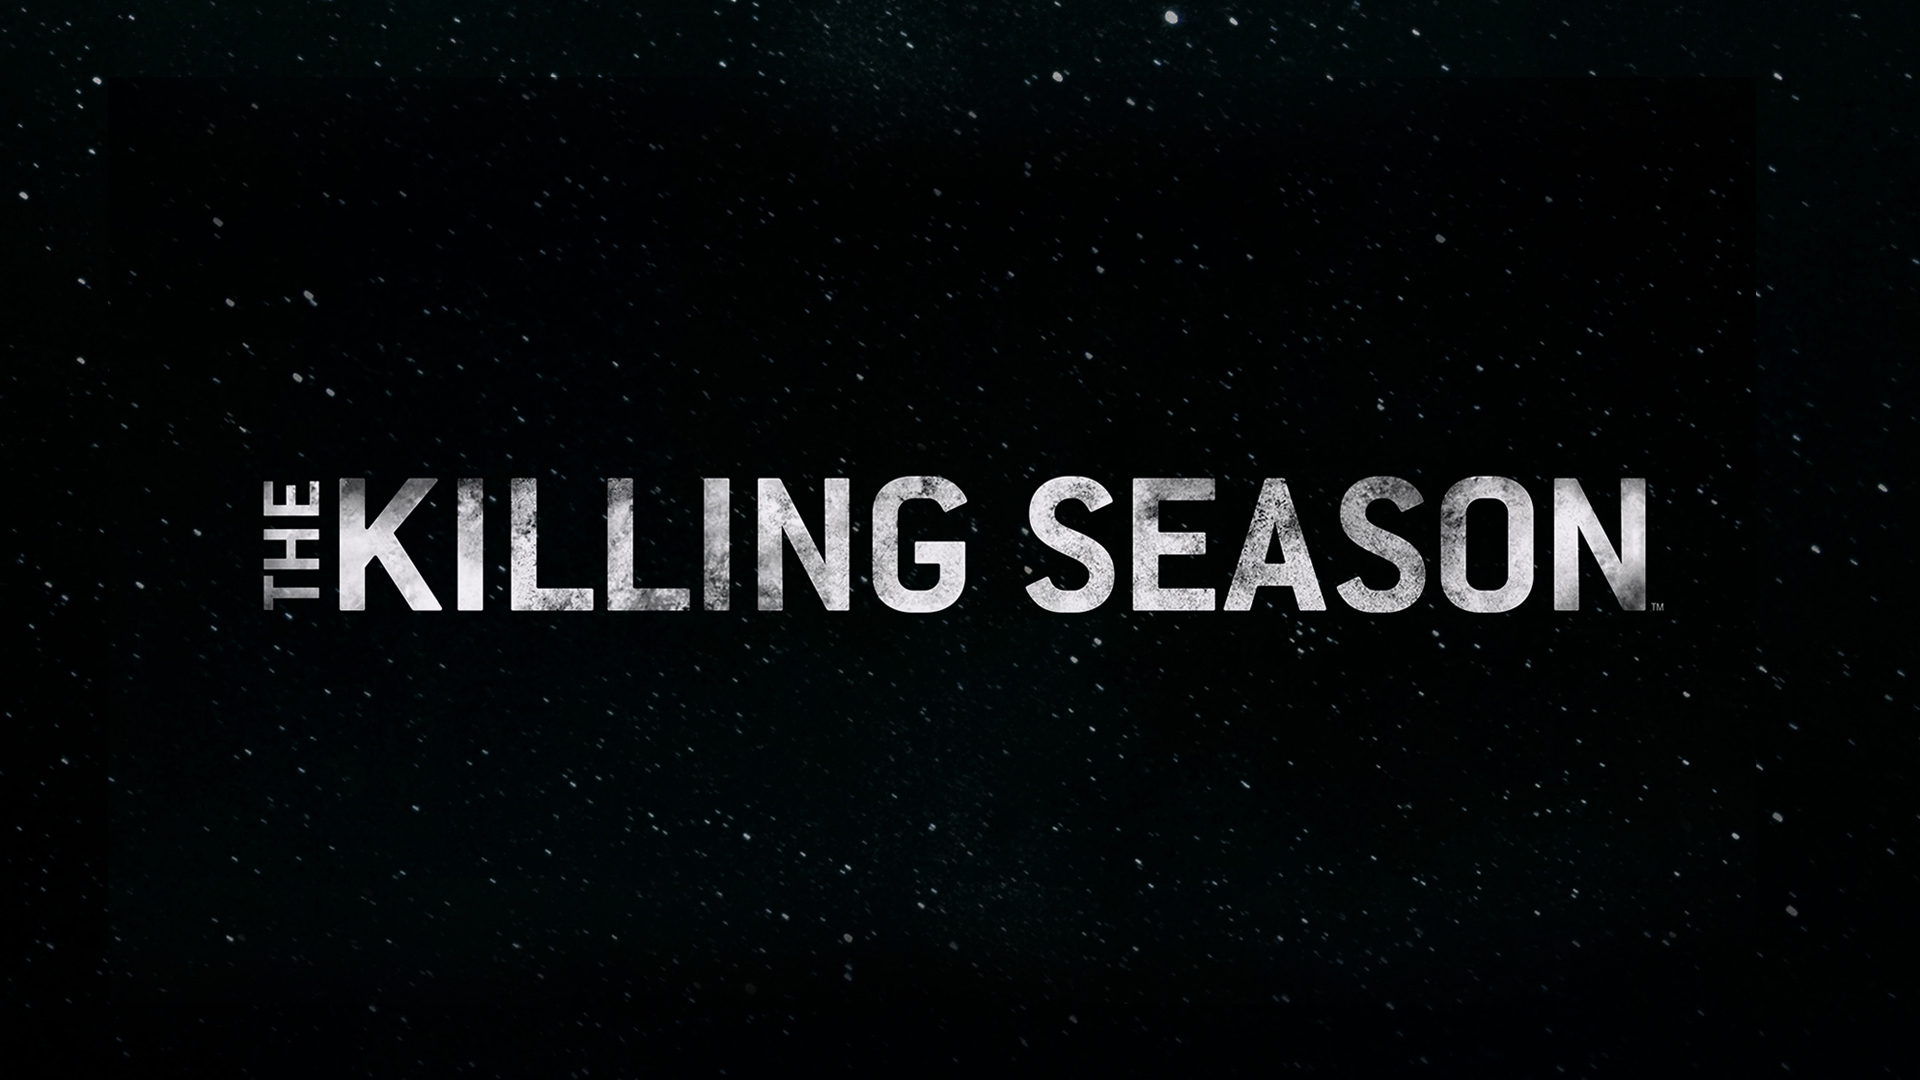 The Killing Season Alt Image